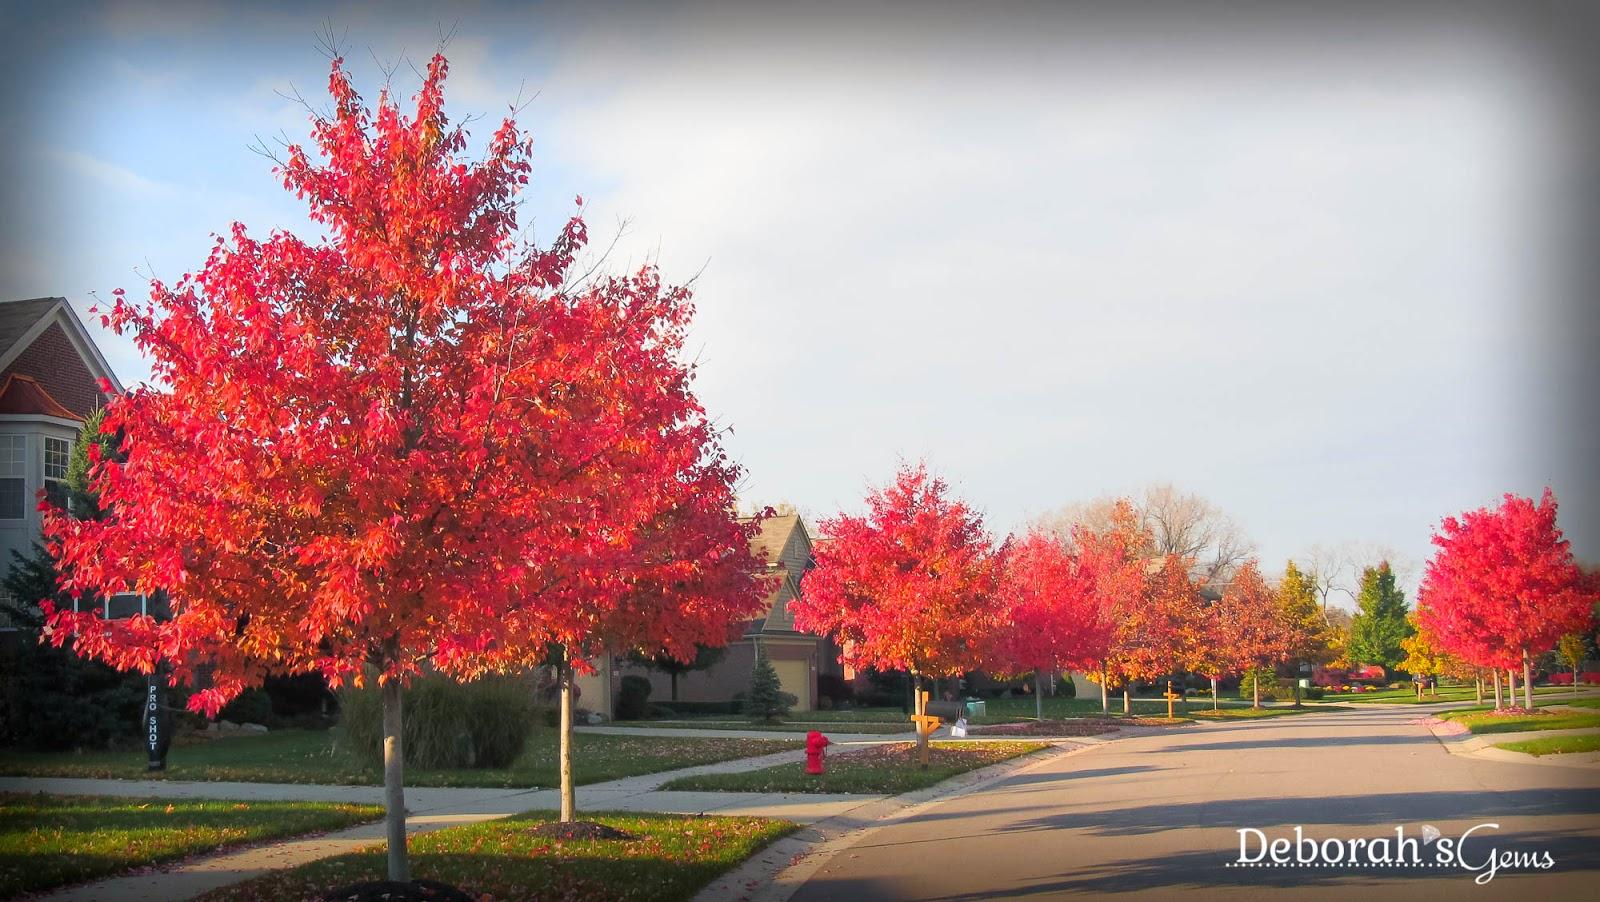 Autumn Glory 1 - photo by Deborah Frings - Deborah's Gems